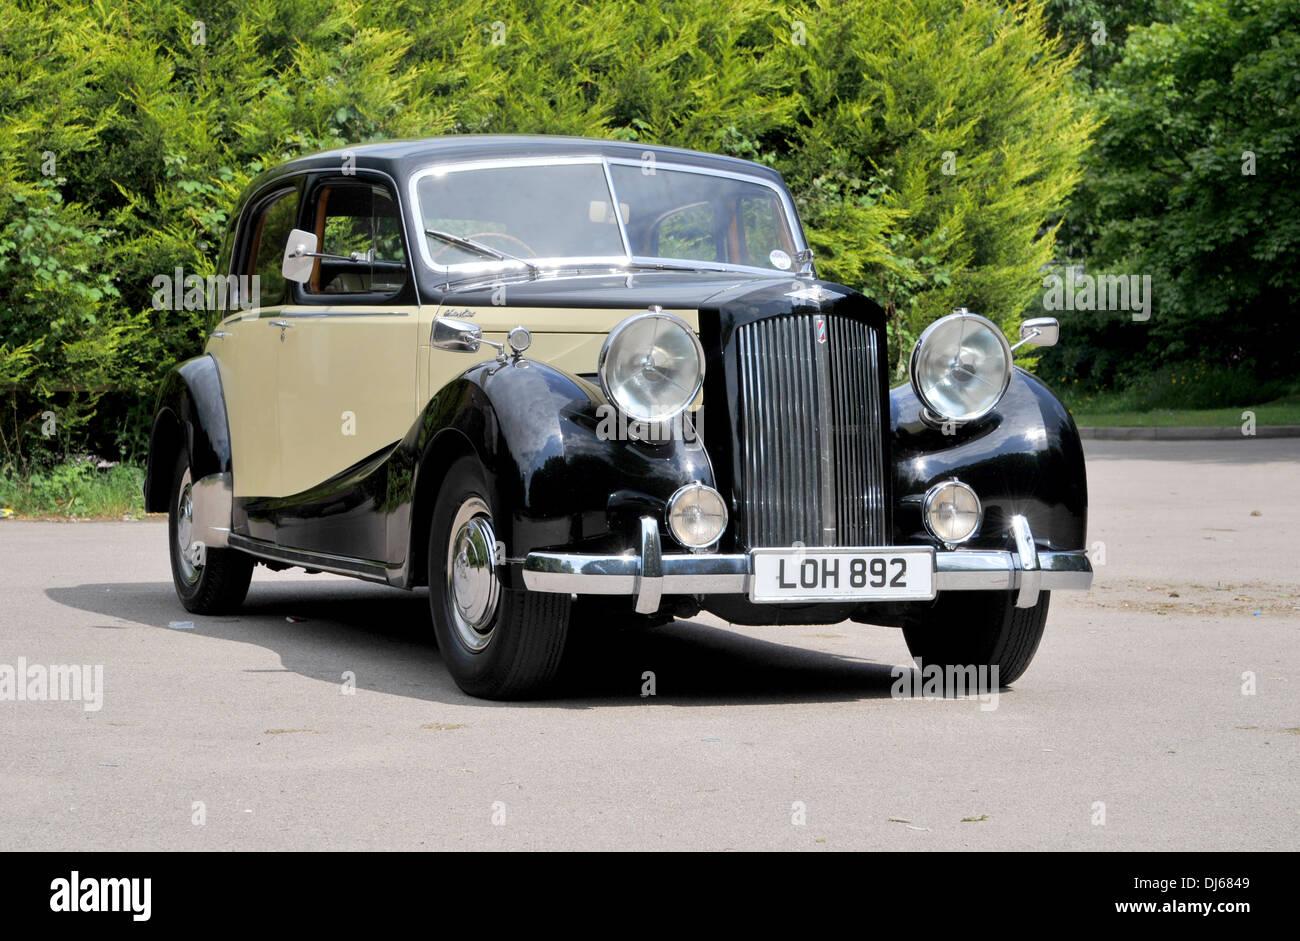 1953 Austin Sheerline klassische britische Luxus-Auto Stockbild